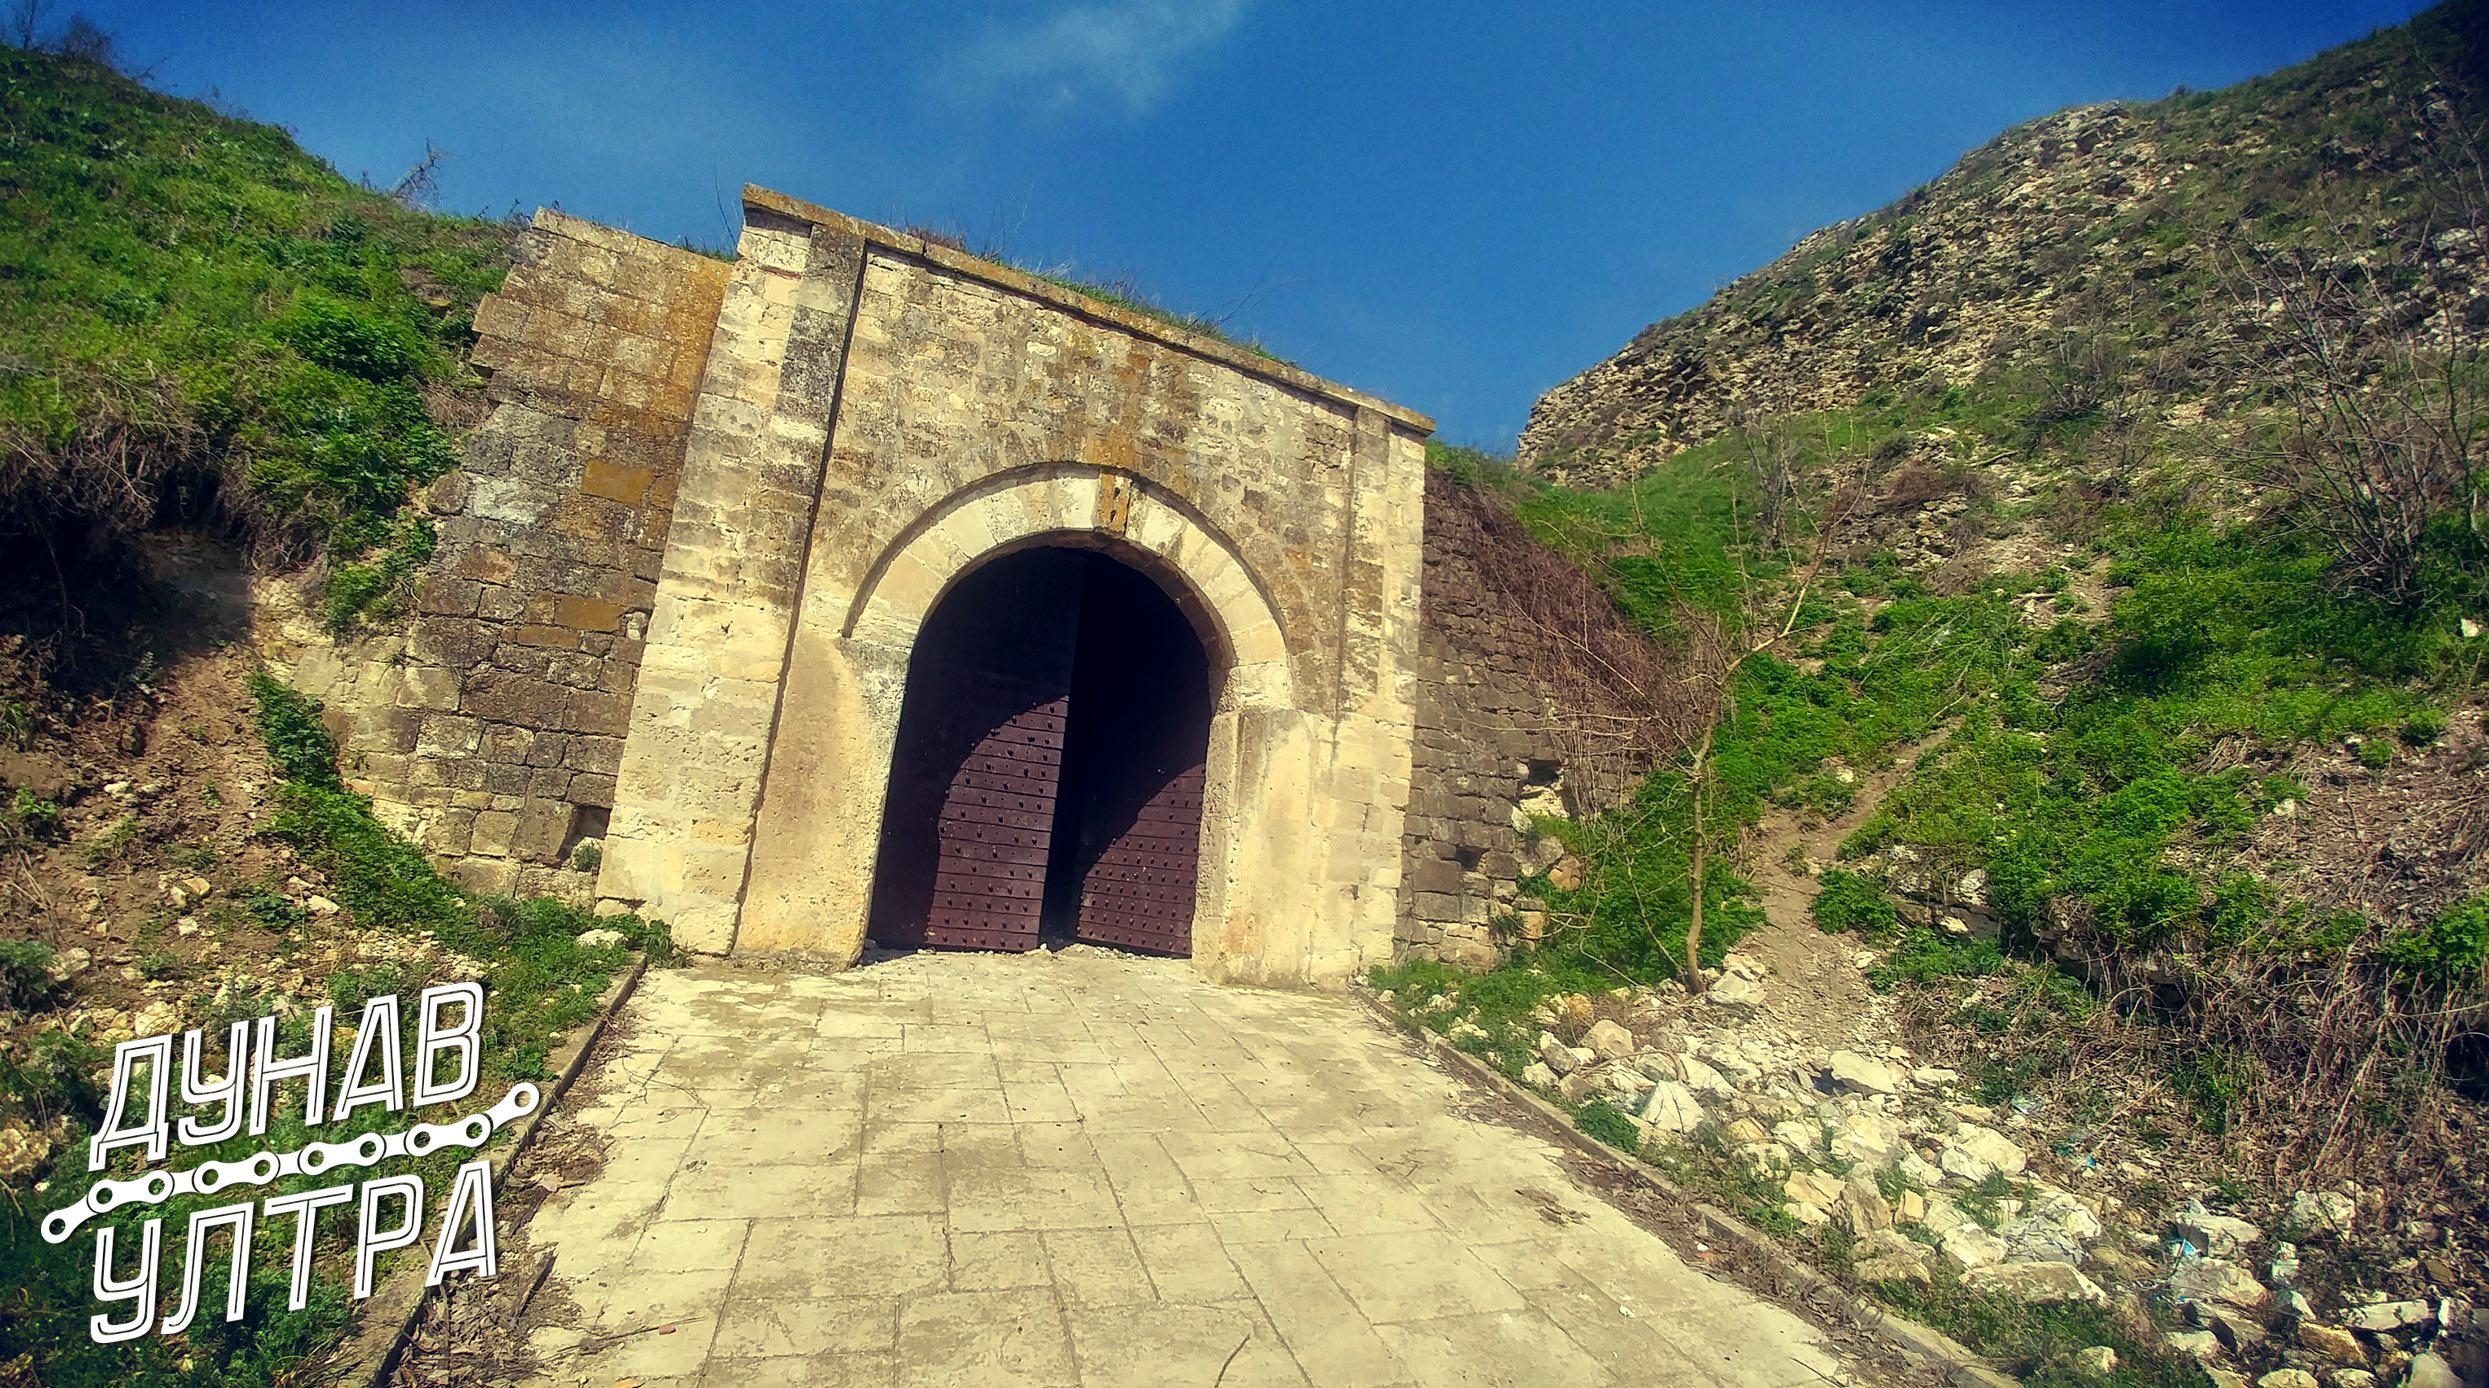 Dunav Ultra 101: The Nikopol Fortress and today's Shishman Gate